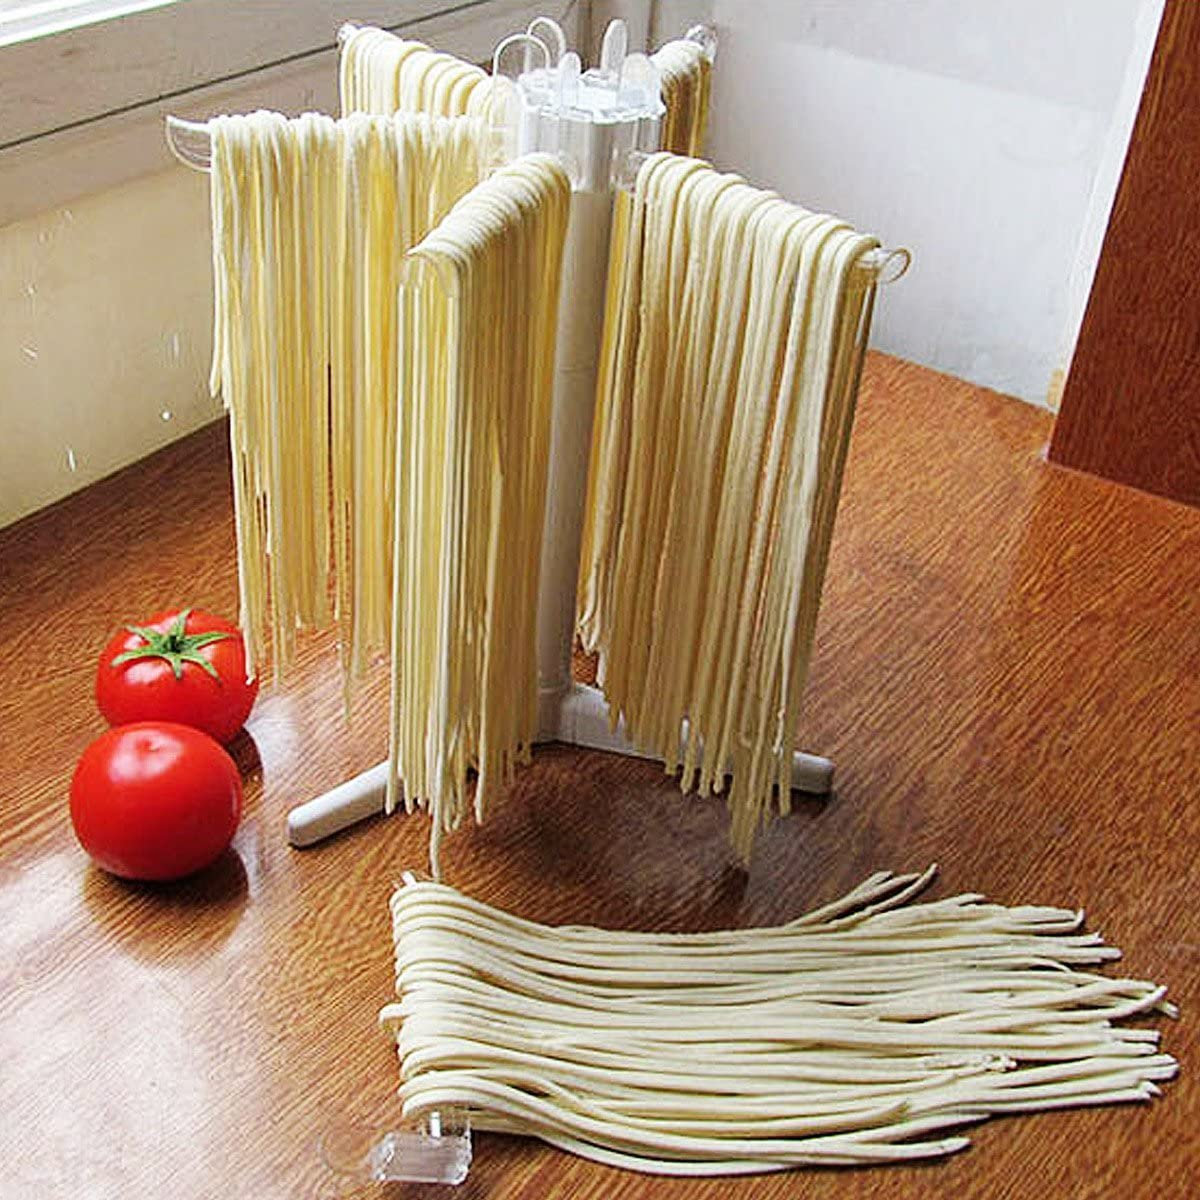 NANHONG S/é Choir /à P/â tes Pliable Support /à Spaghetti Nouilles